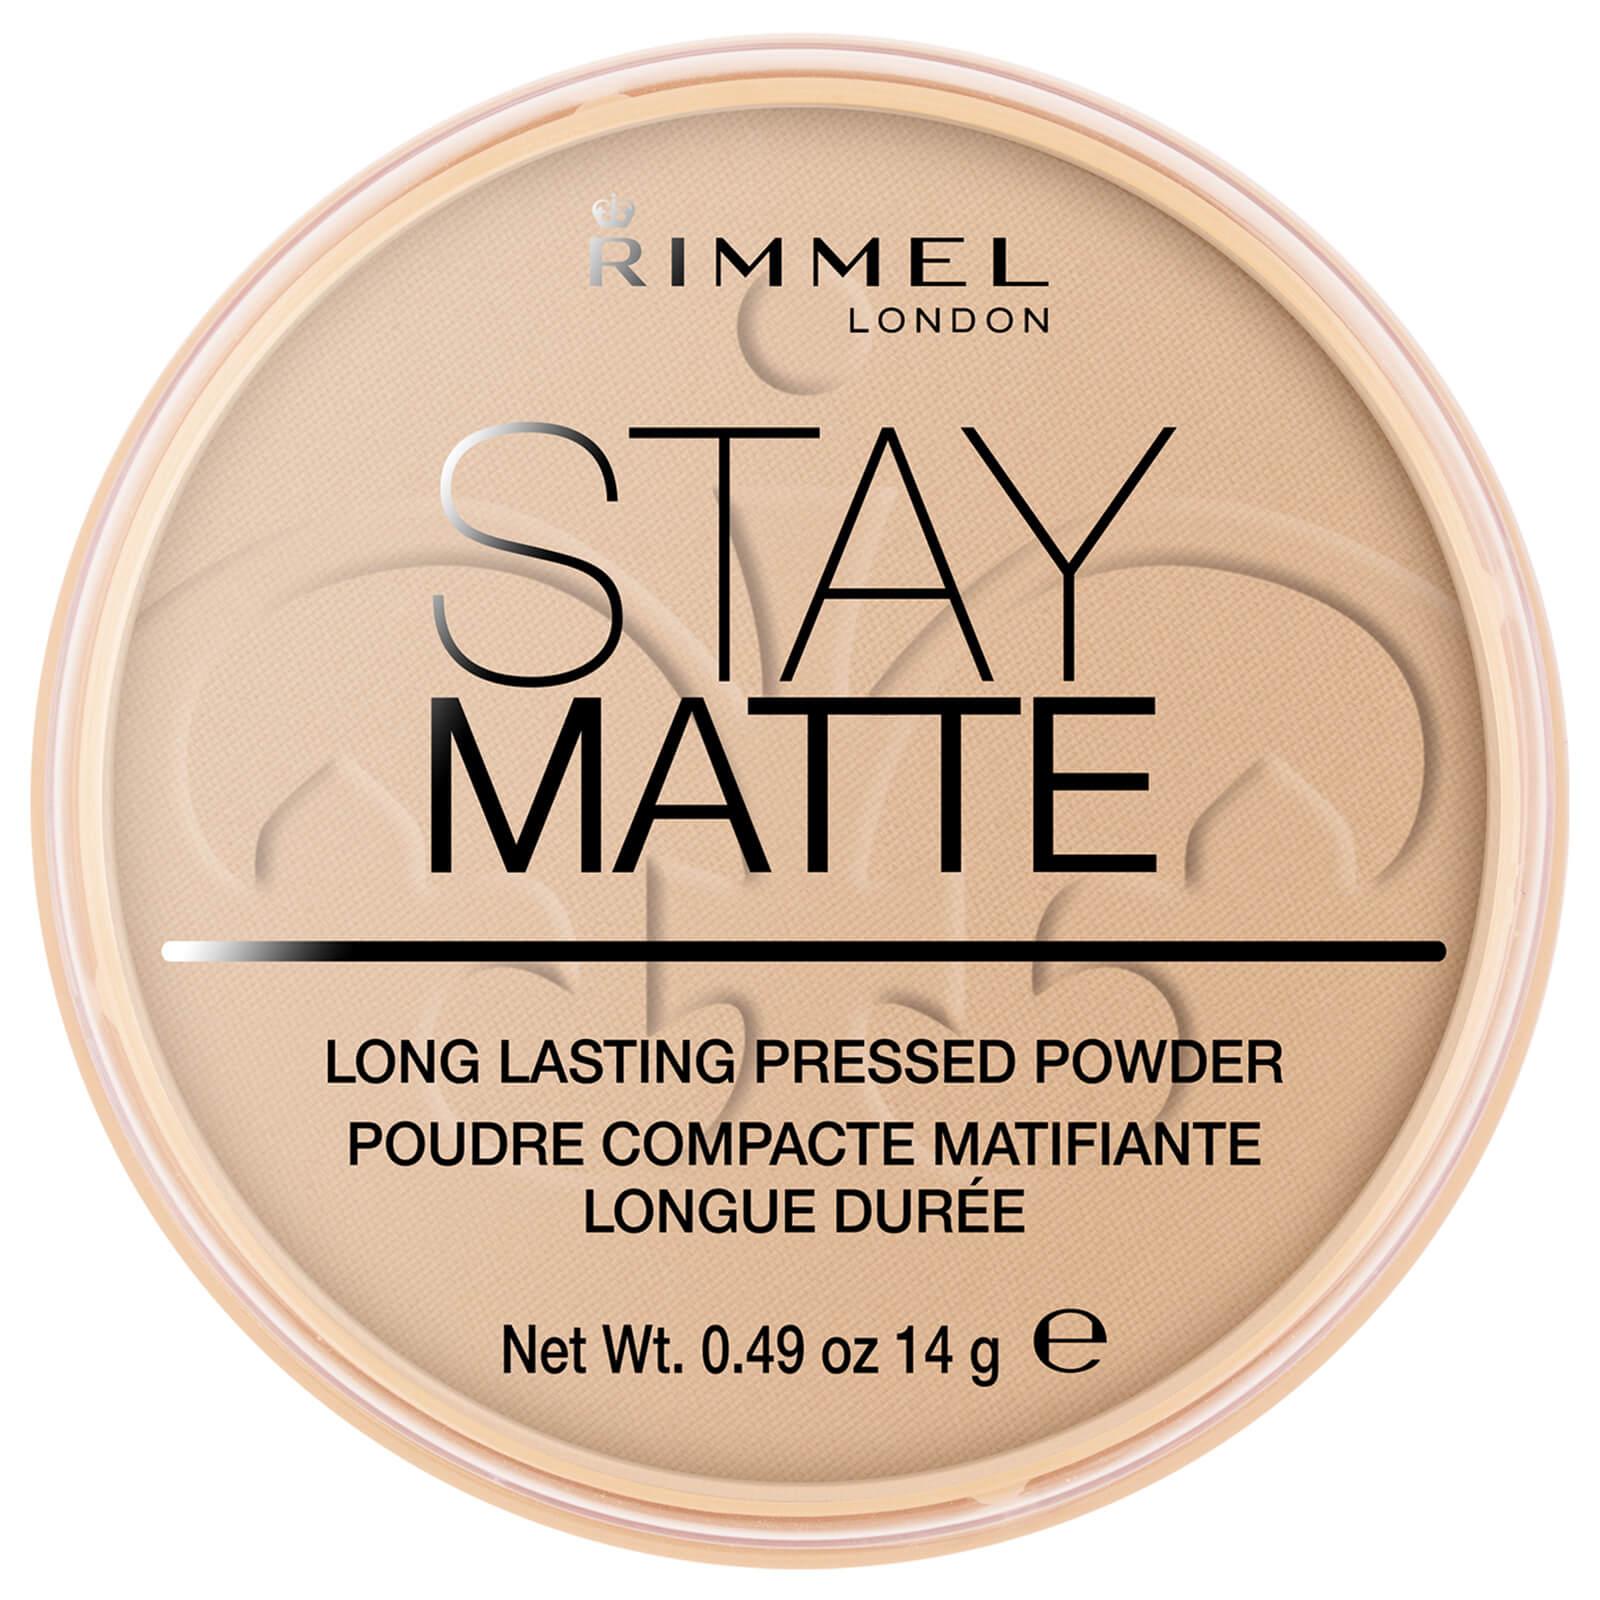 rimmel stay matte pressed powder (various shades) - sandstorm